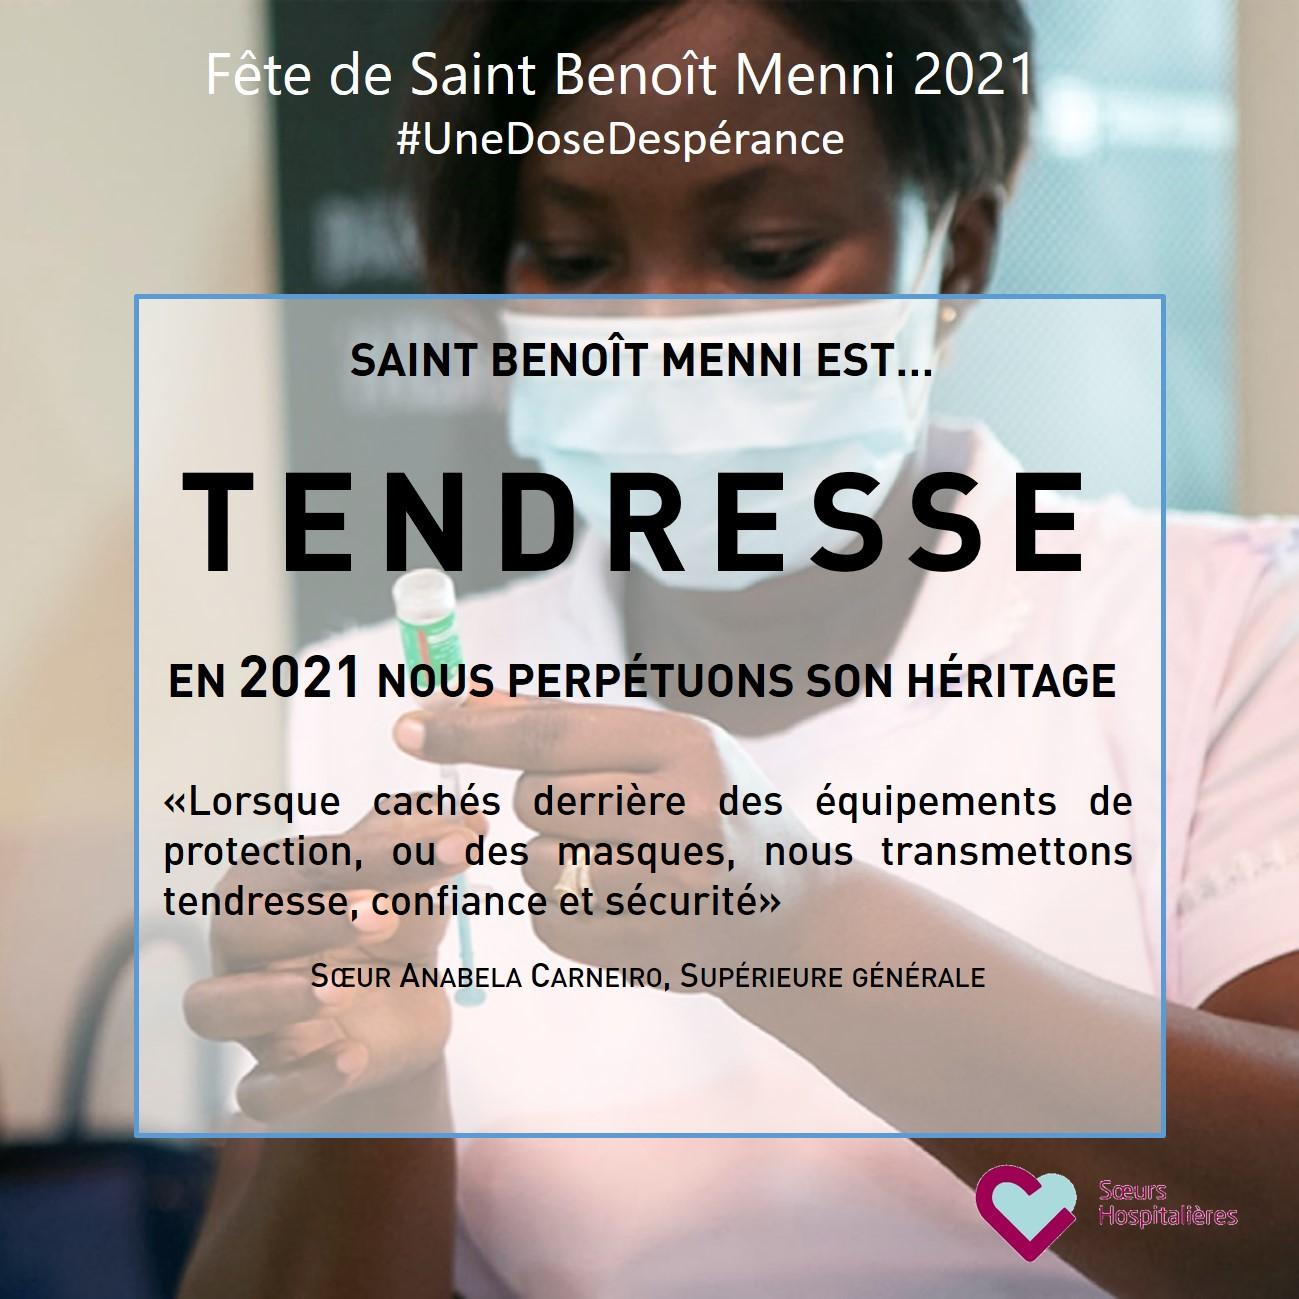 semaine-saint-benoit-menni-2021-3